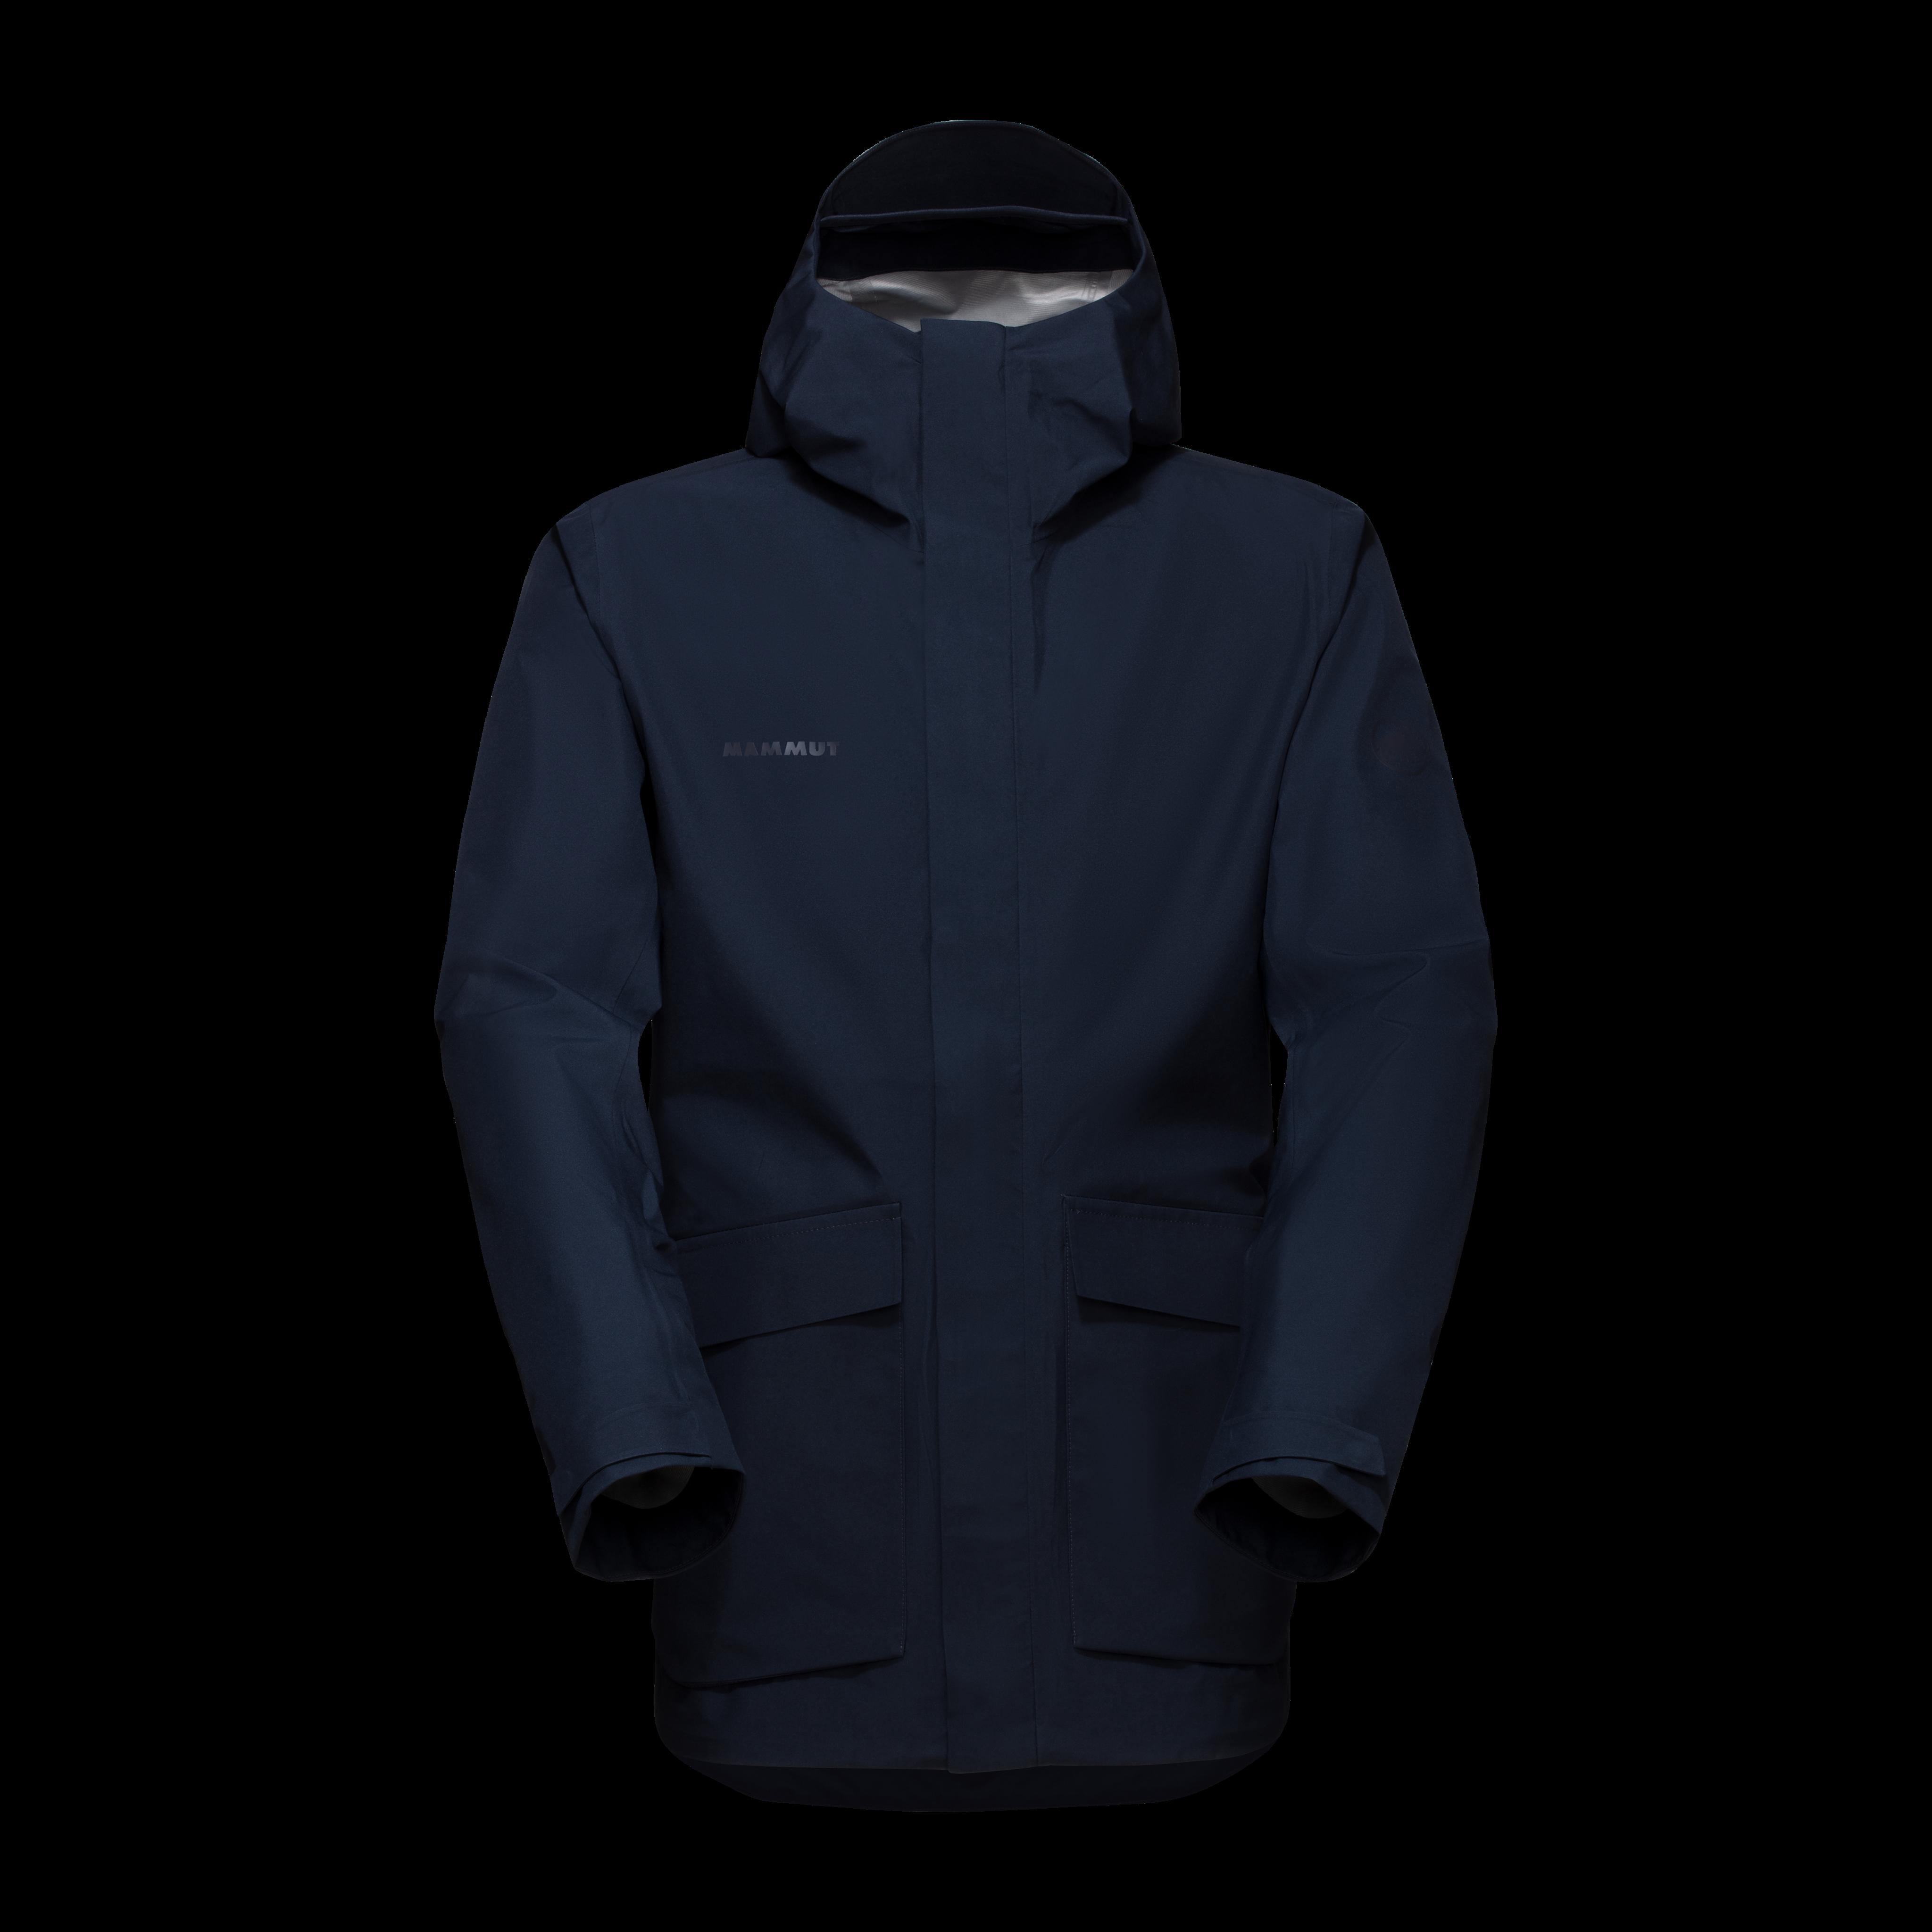 Mammut 3L HS Hooded Jacket Men - L, marine thumbnail